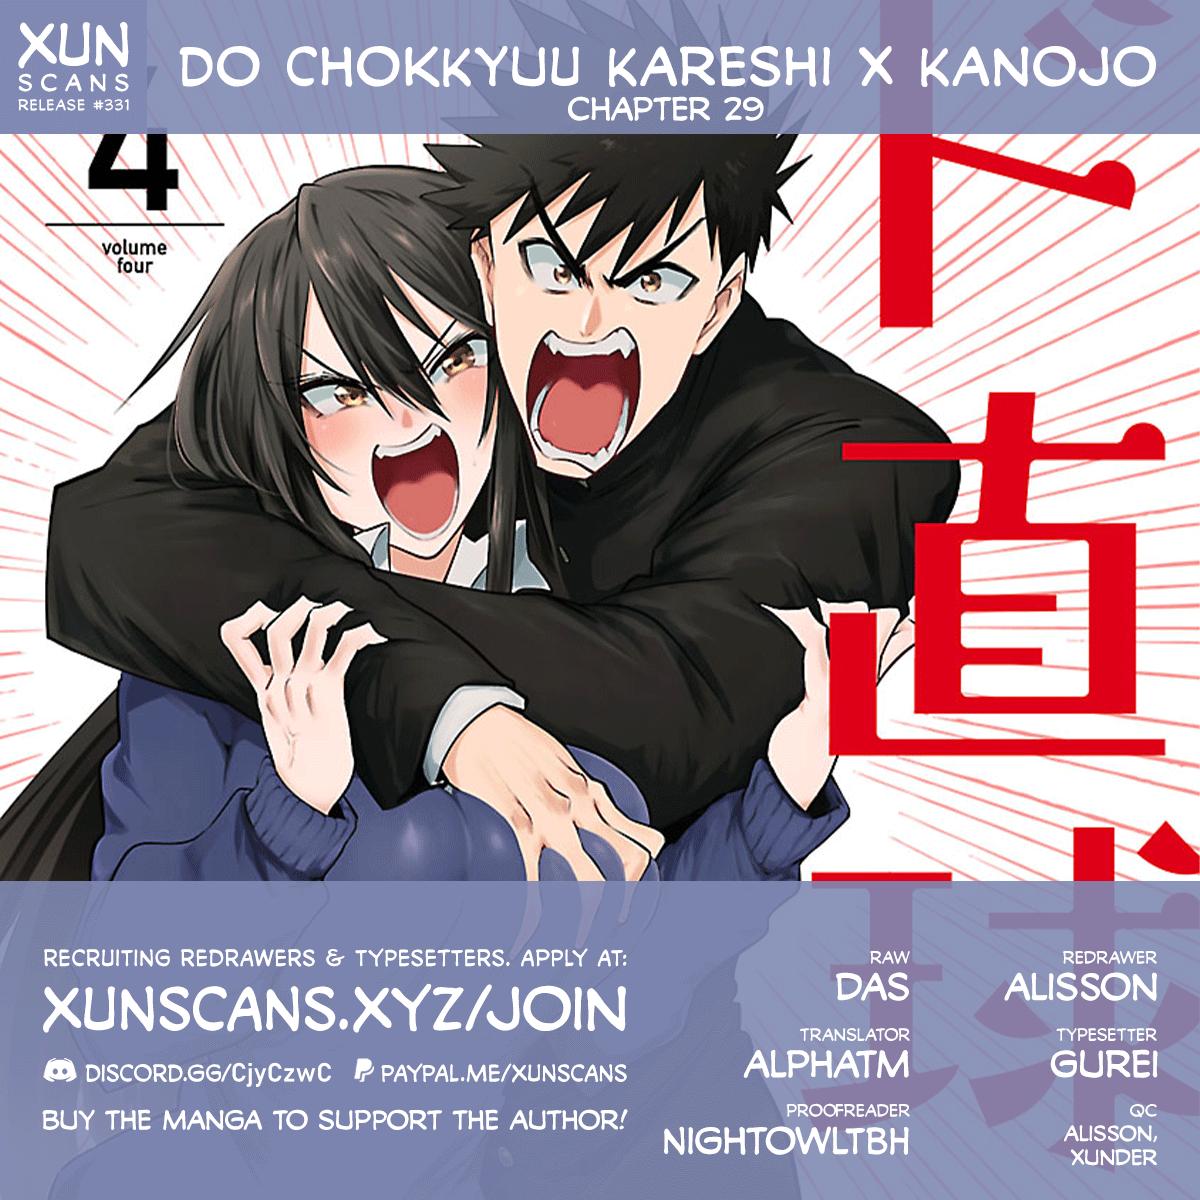 Manga Do Chokkyuu Kareshi x Kanojo - Chapter 29 Page 1